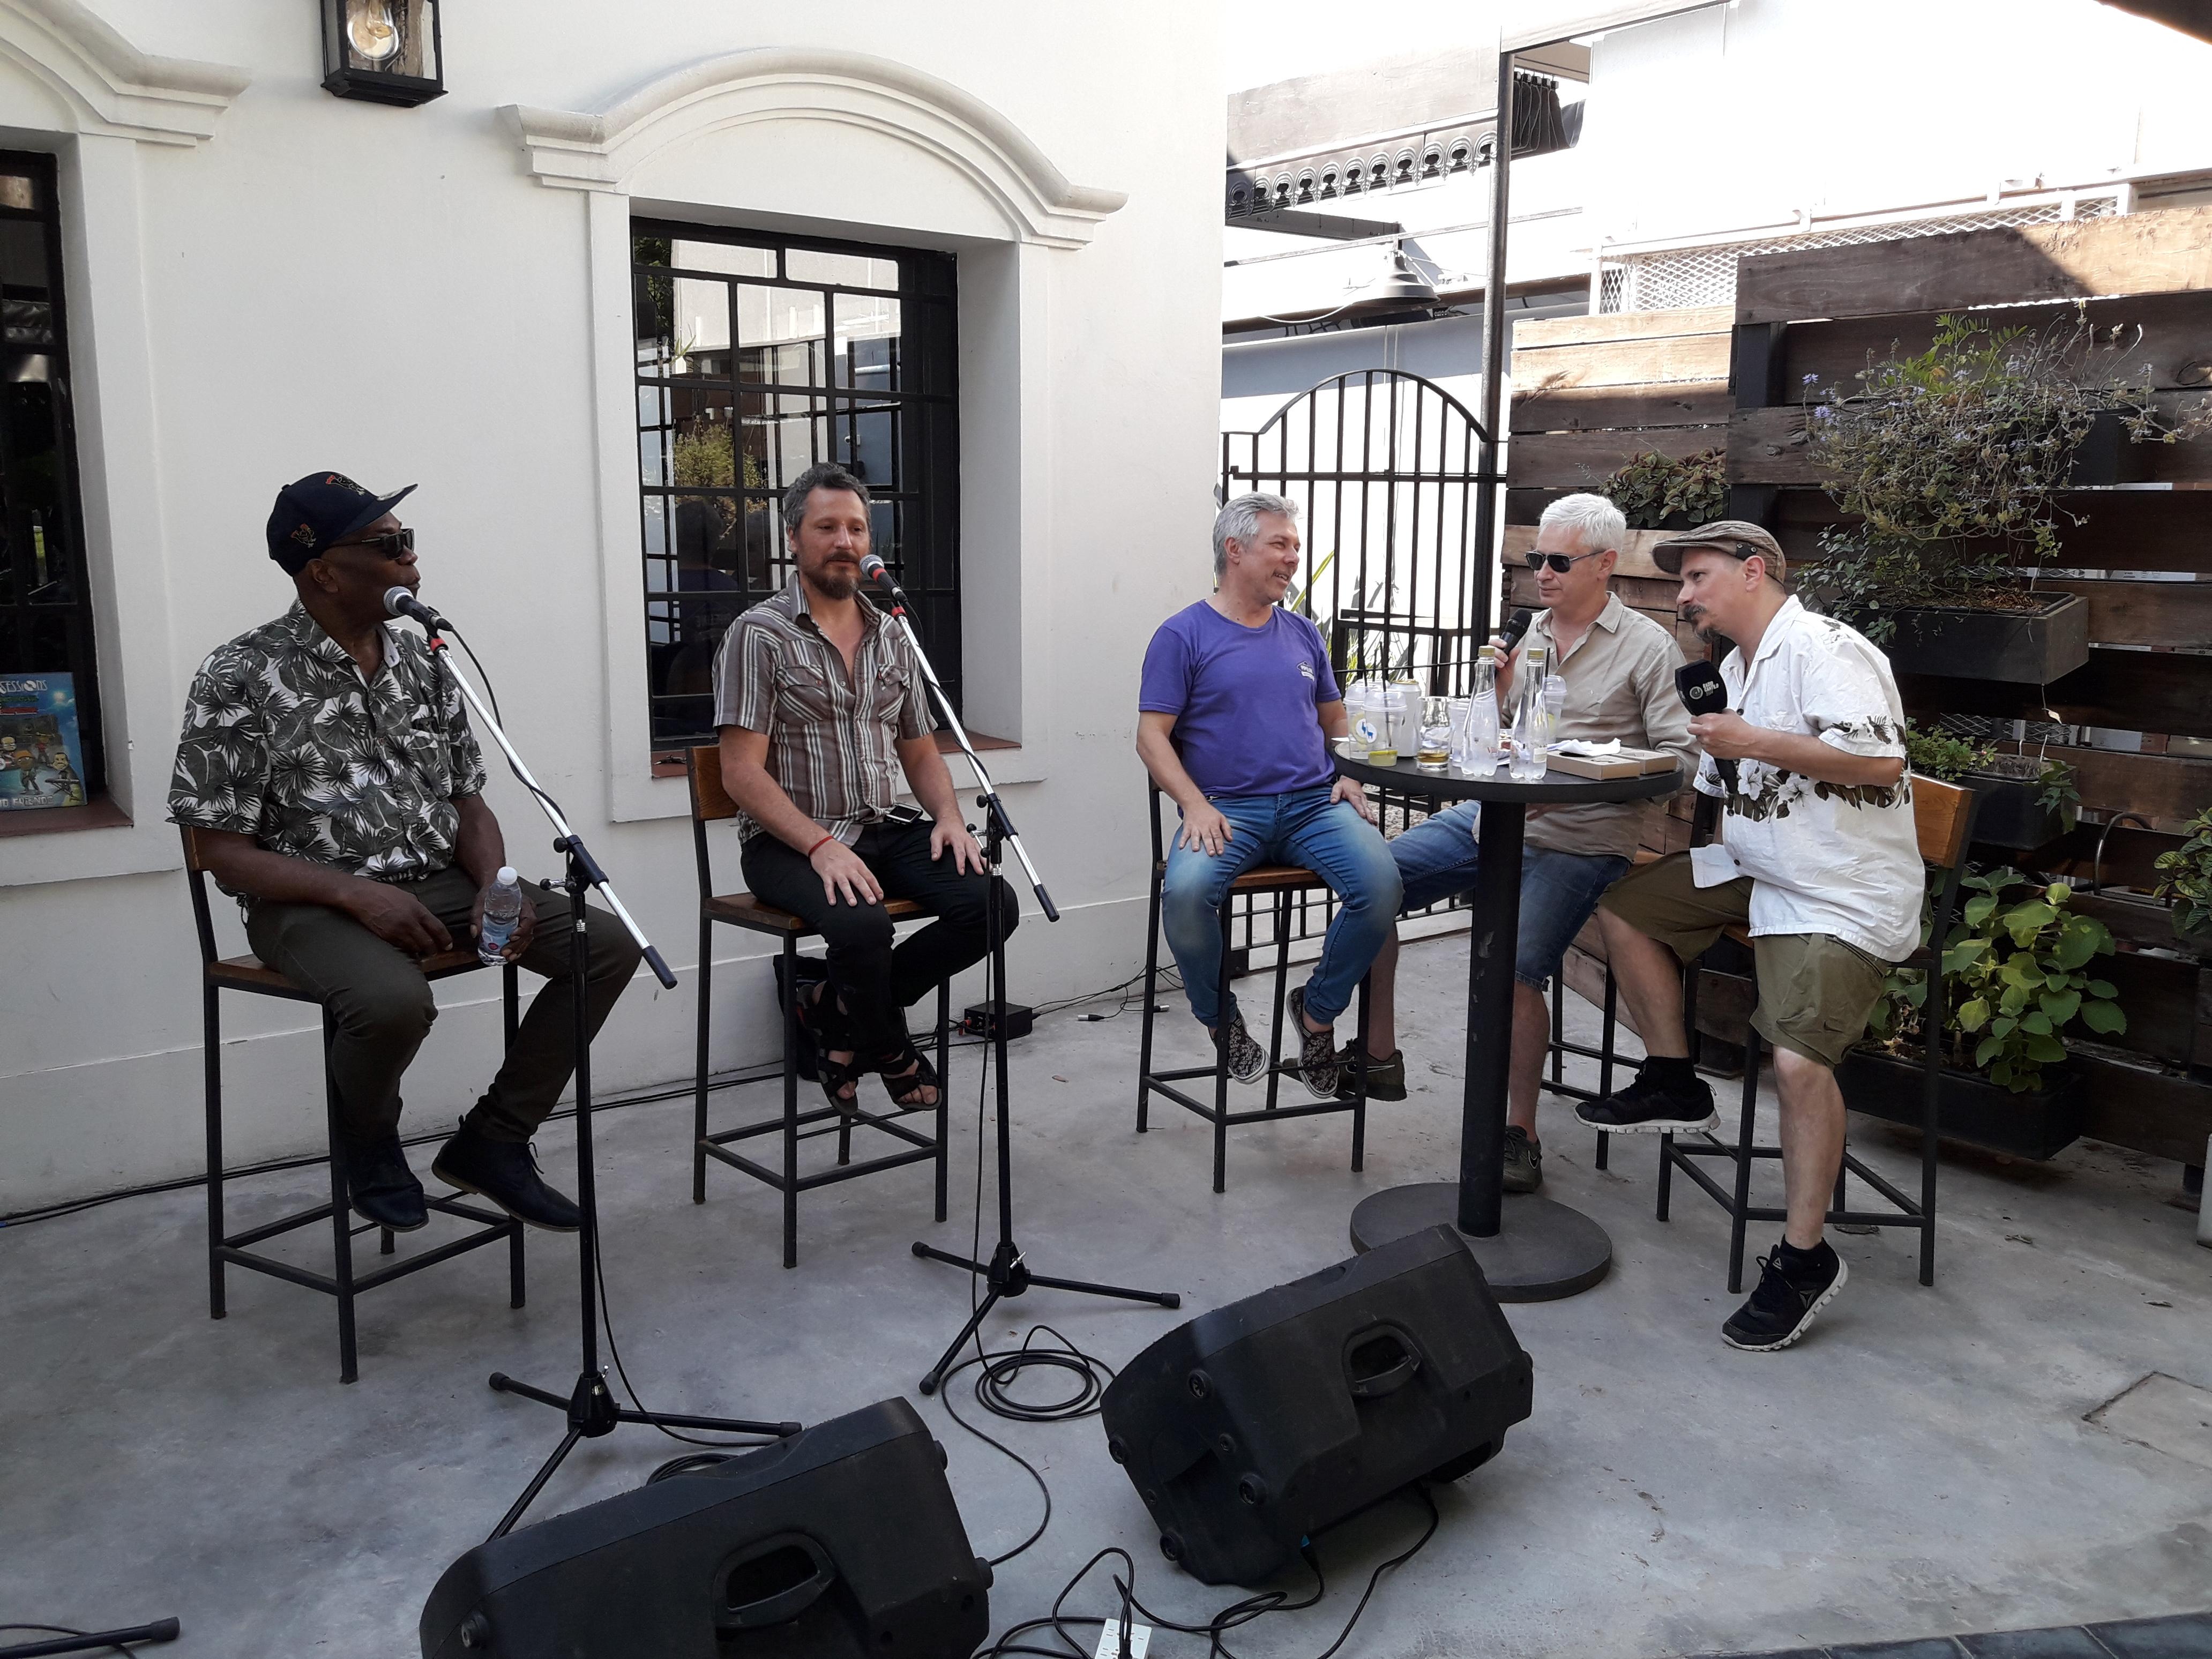 Una tarde a puro reggae con Dennis Bovell - Radio Cantilo